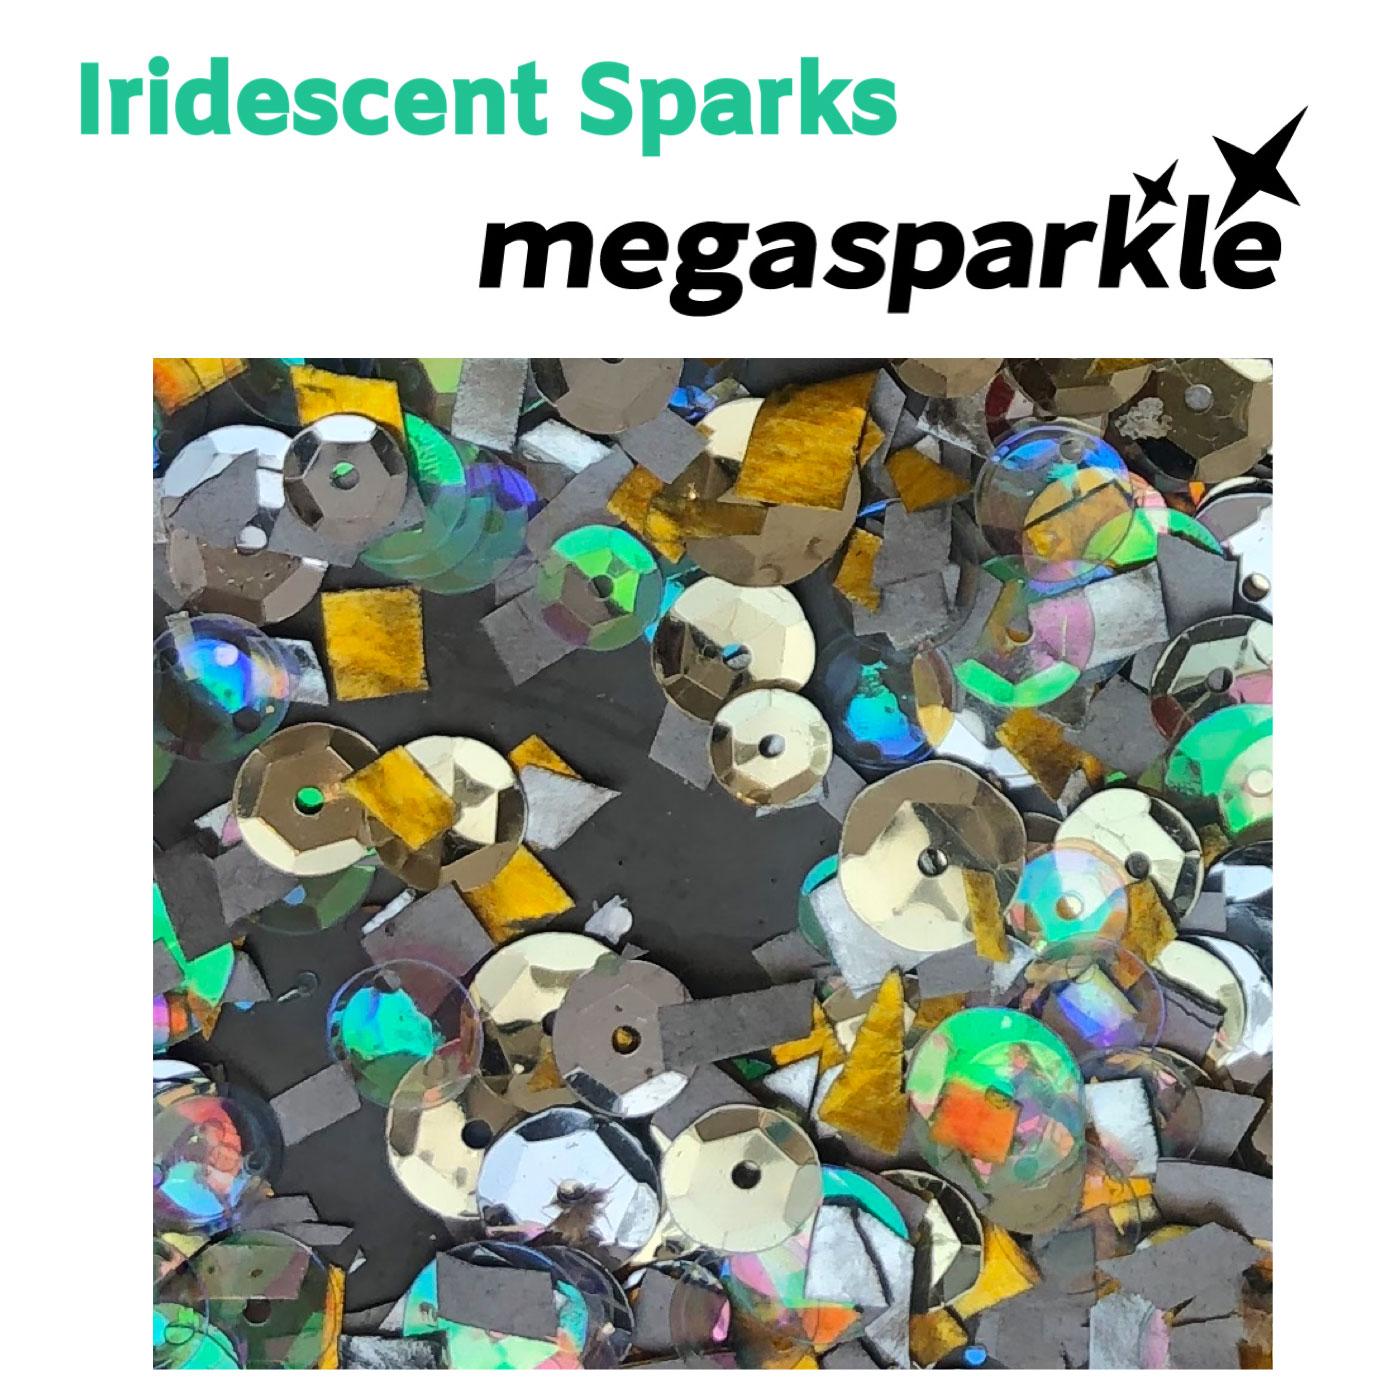 Iridescent Sparks